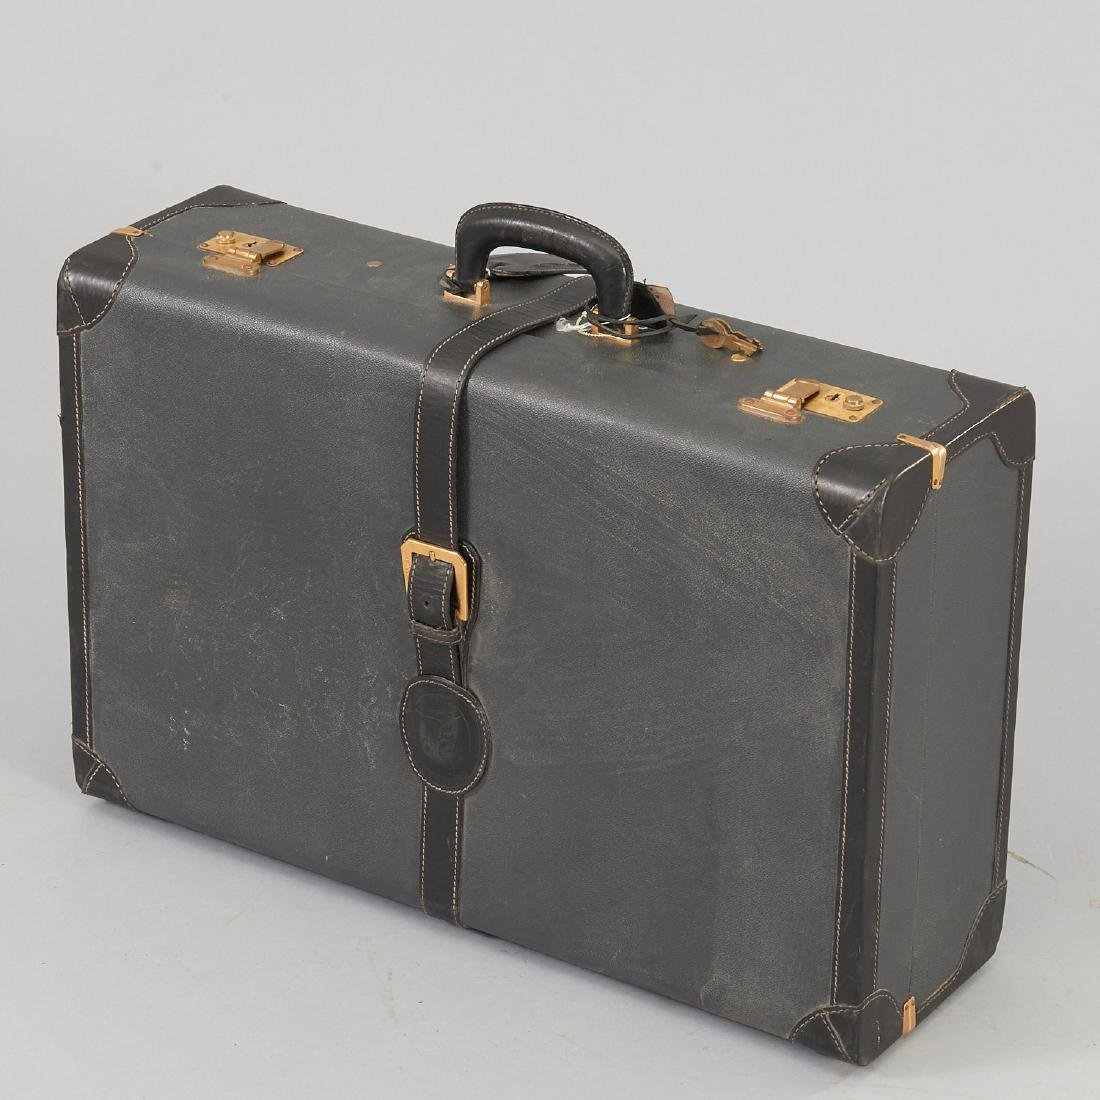 Vintage Trussardi suitcase